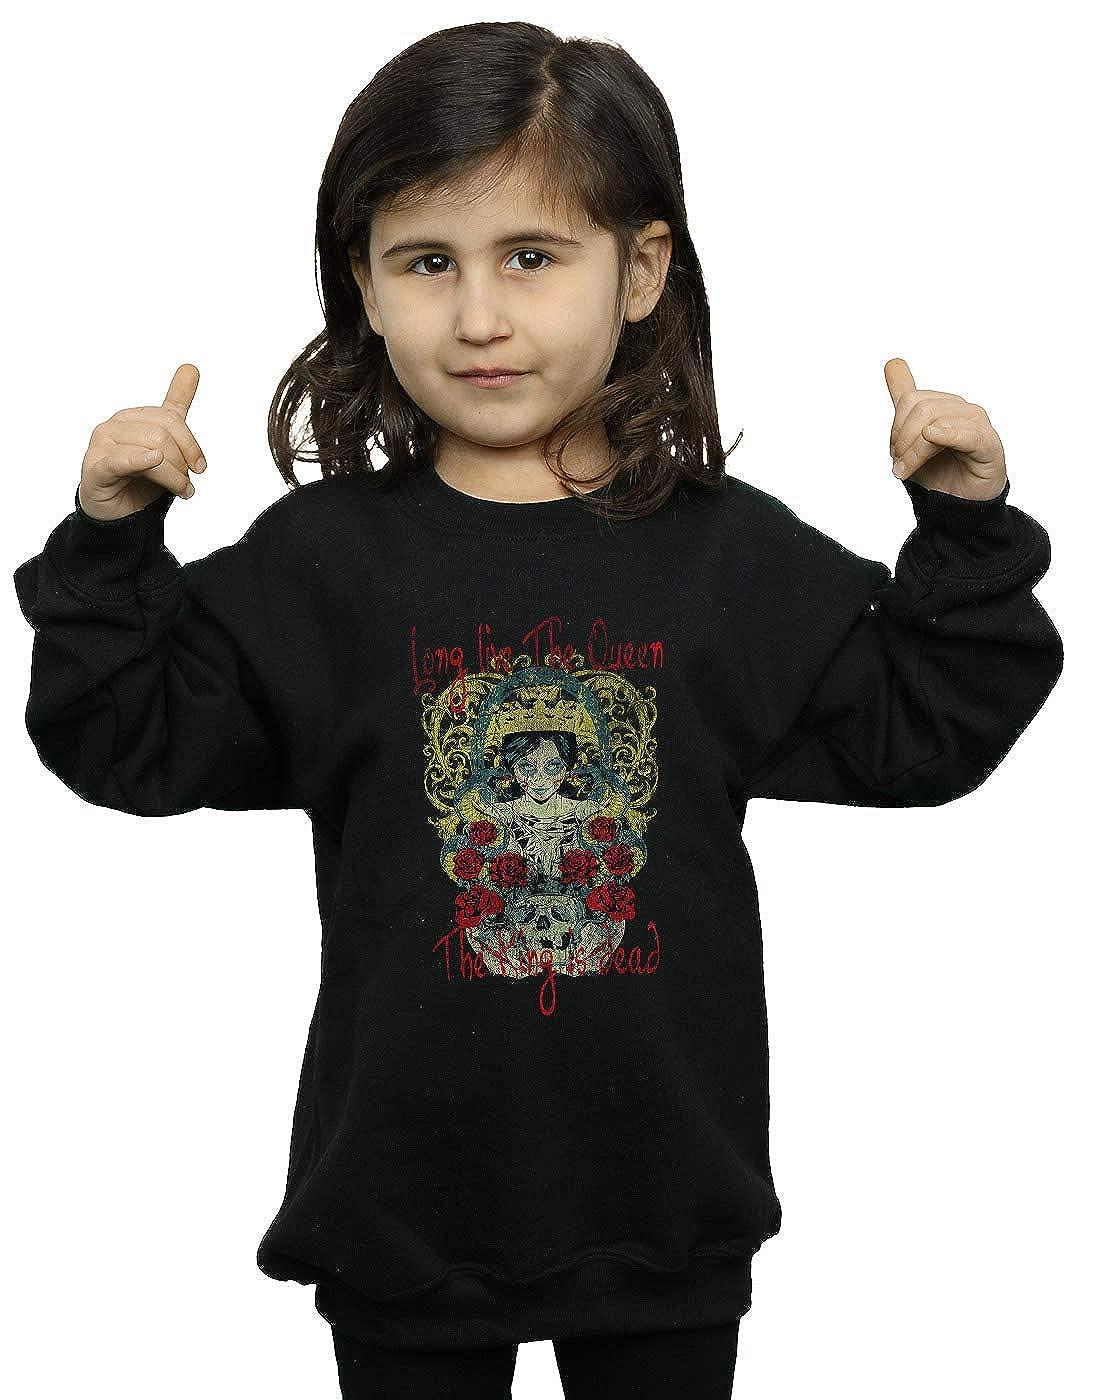 Absolute Cult Drewbacca Girls Long Live The Queen Sweatshirt